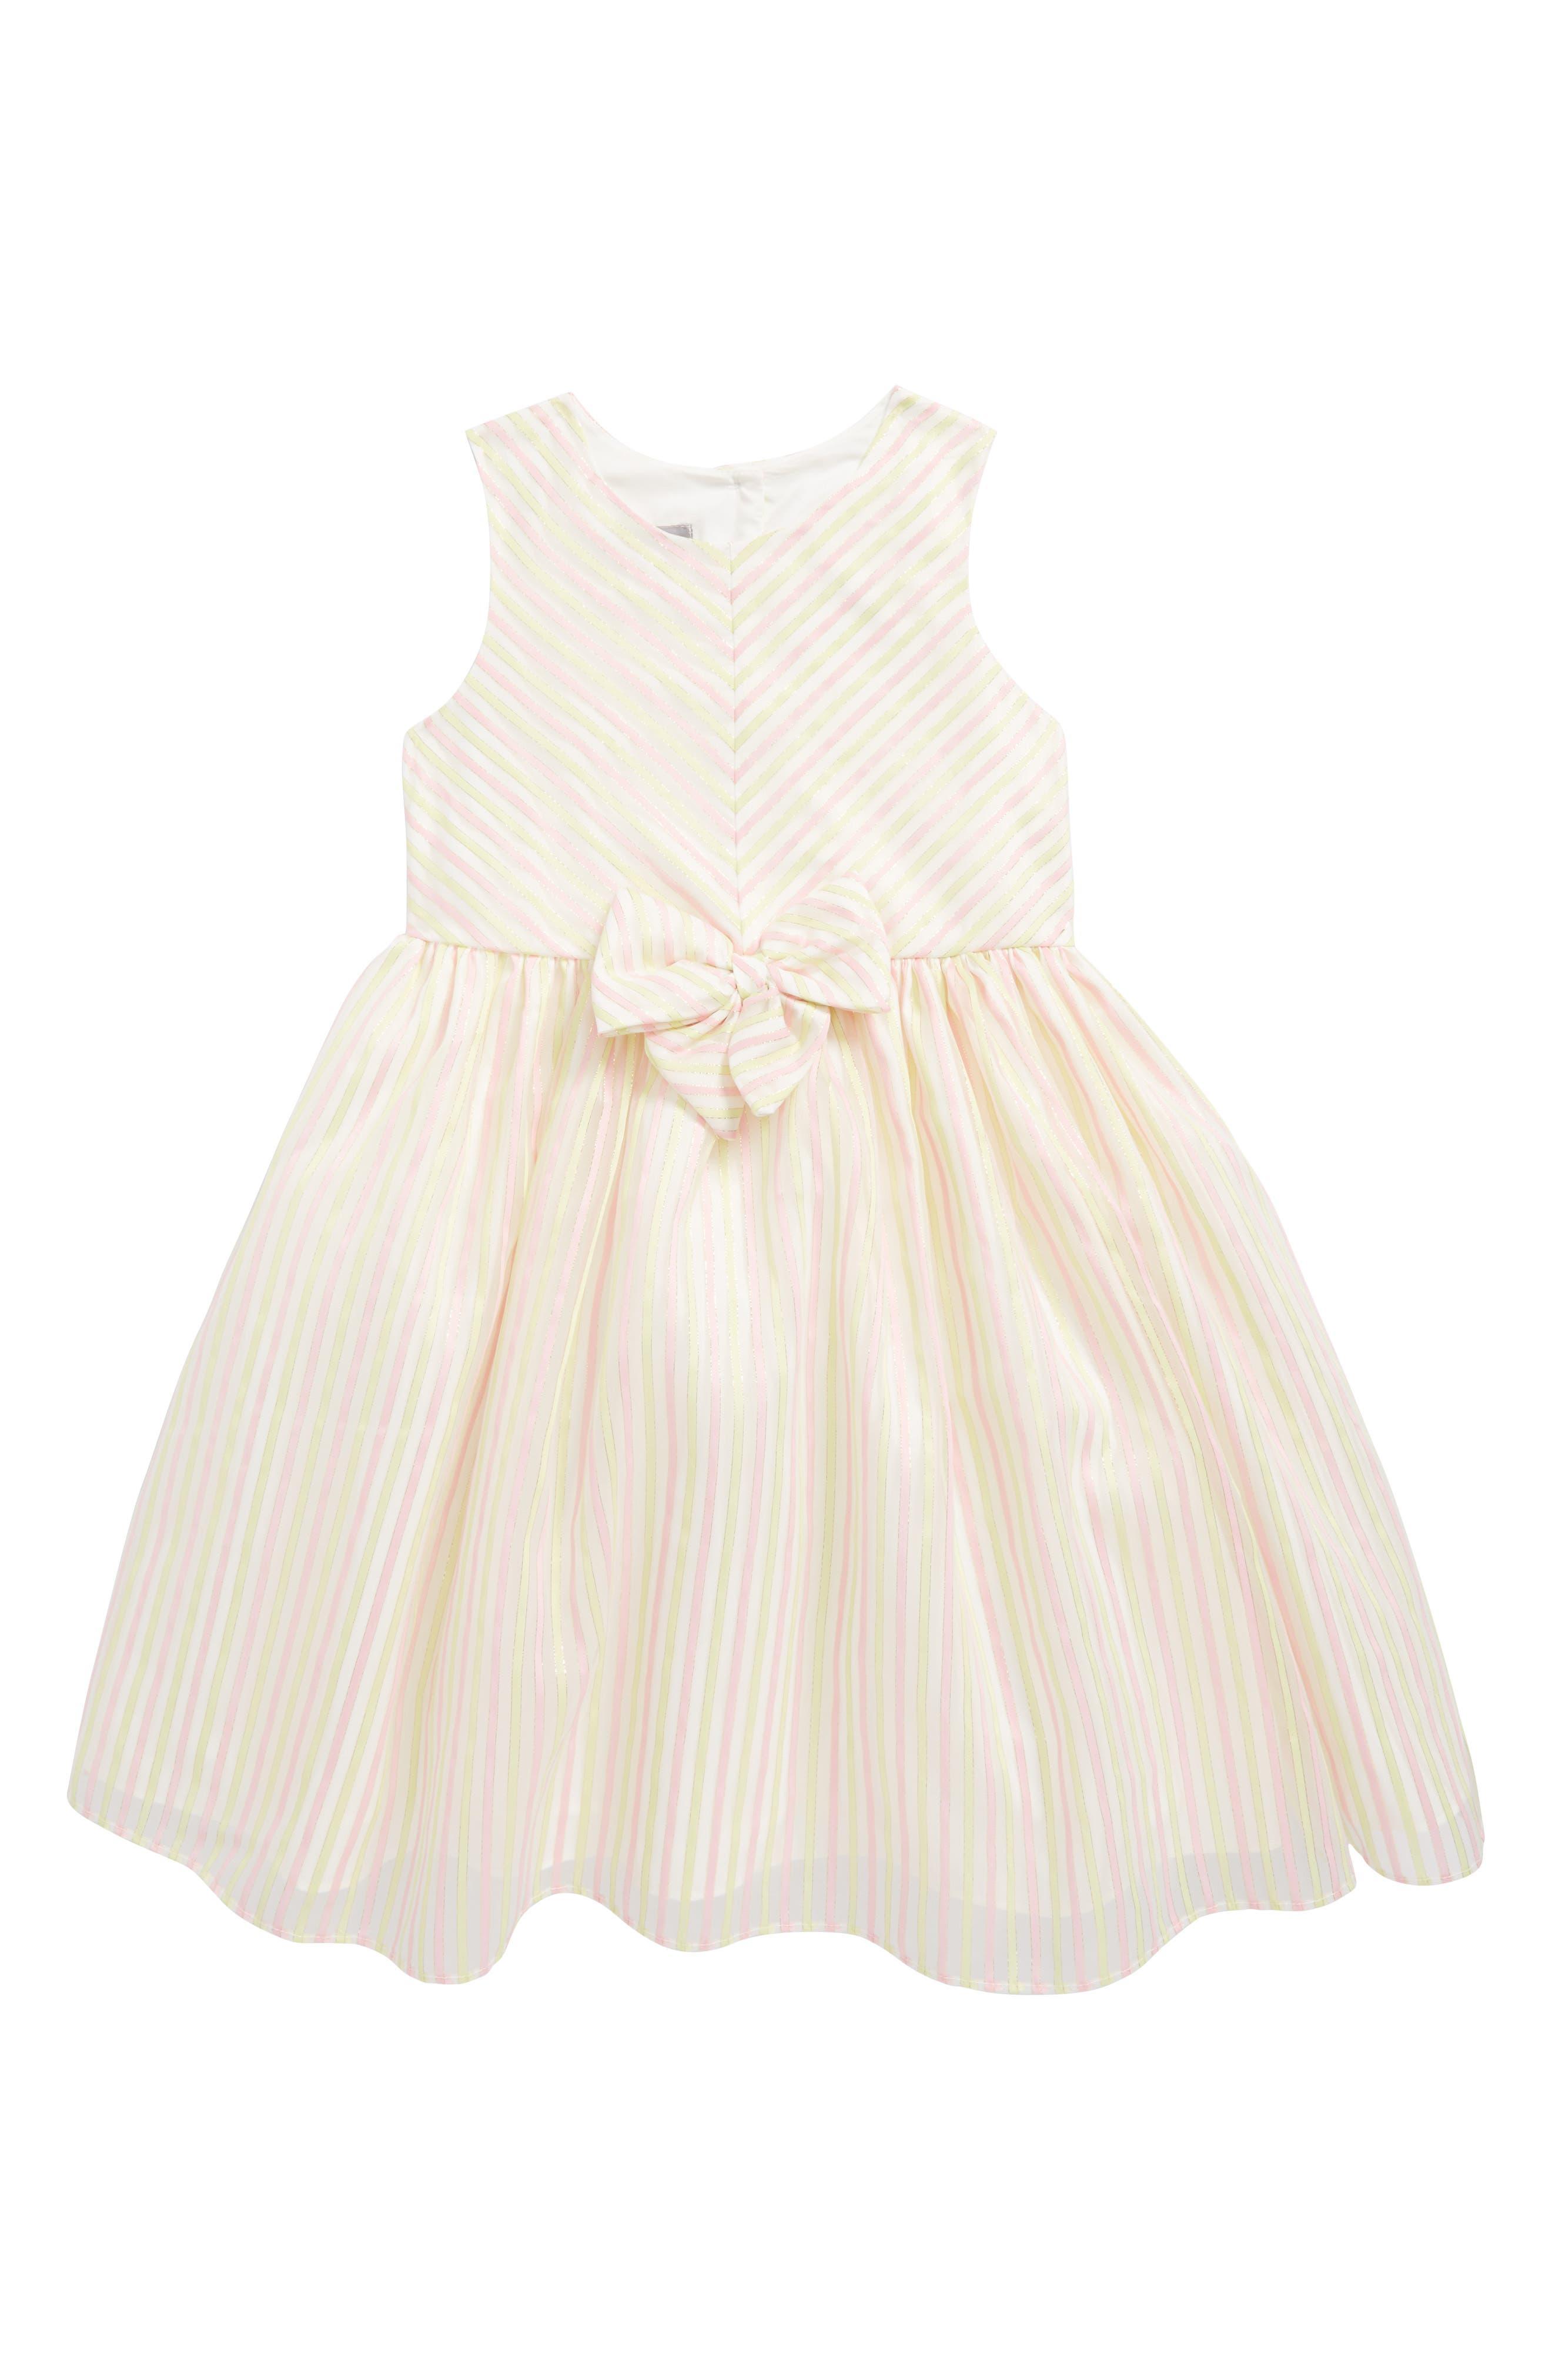 Pastourelle by Pippa & Julie Metallic Stripe Dress (Toddler Girls, Little Girls & Big Girls)